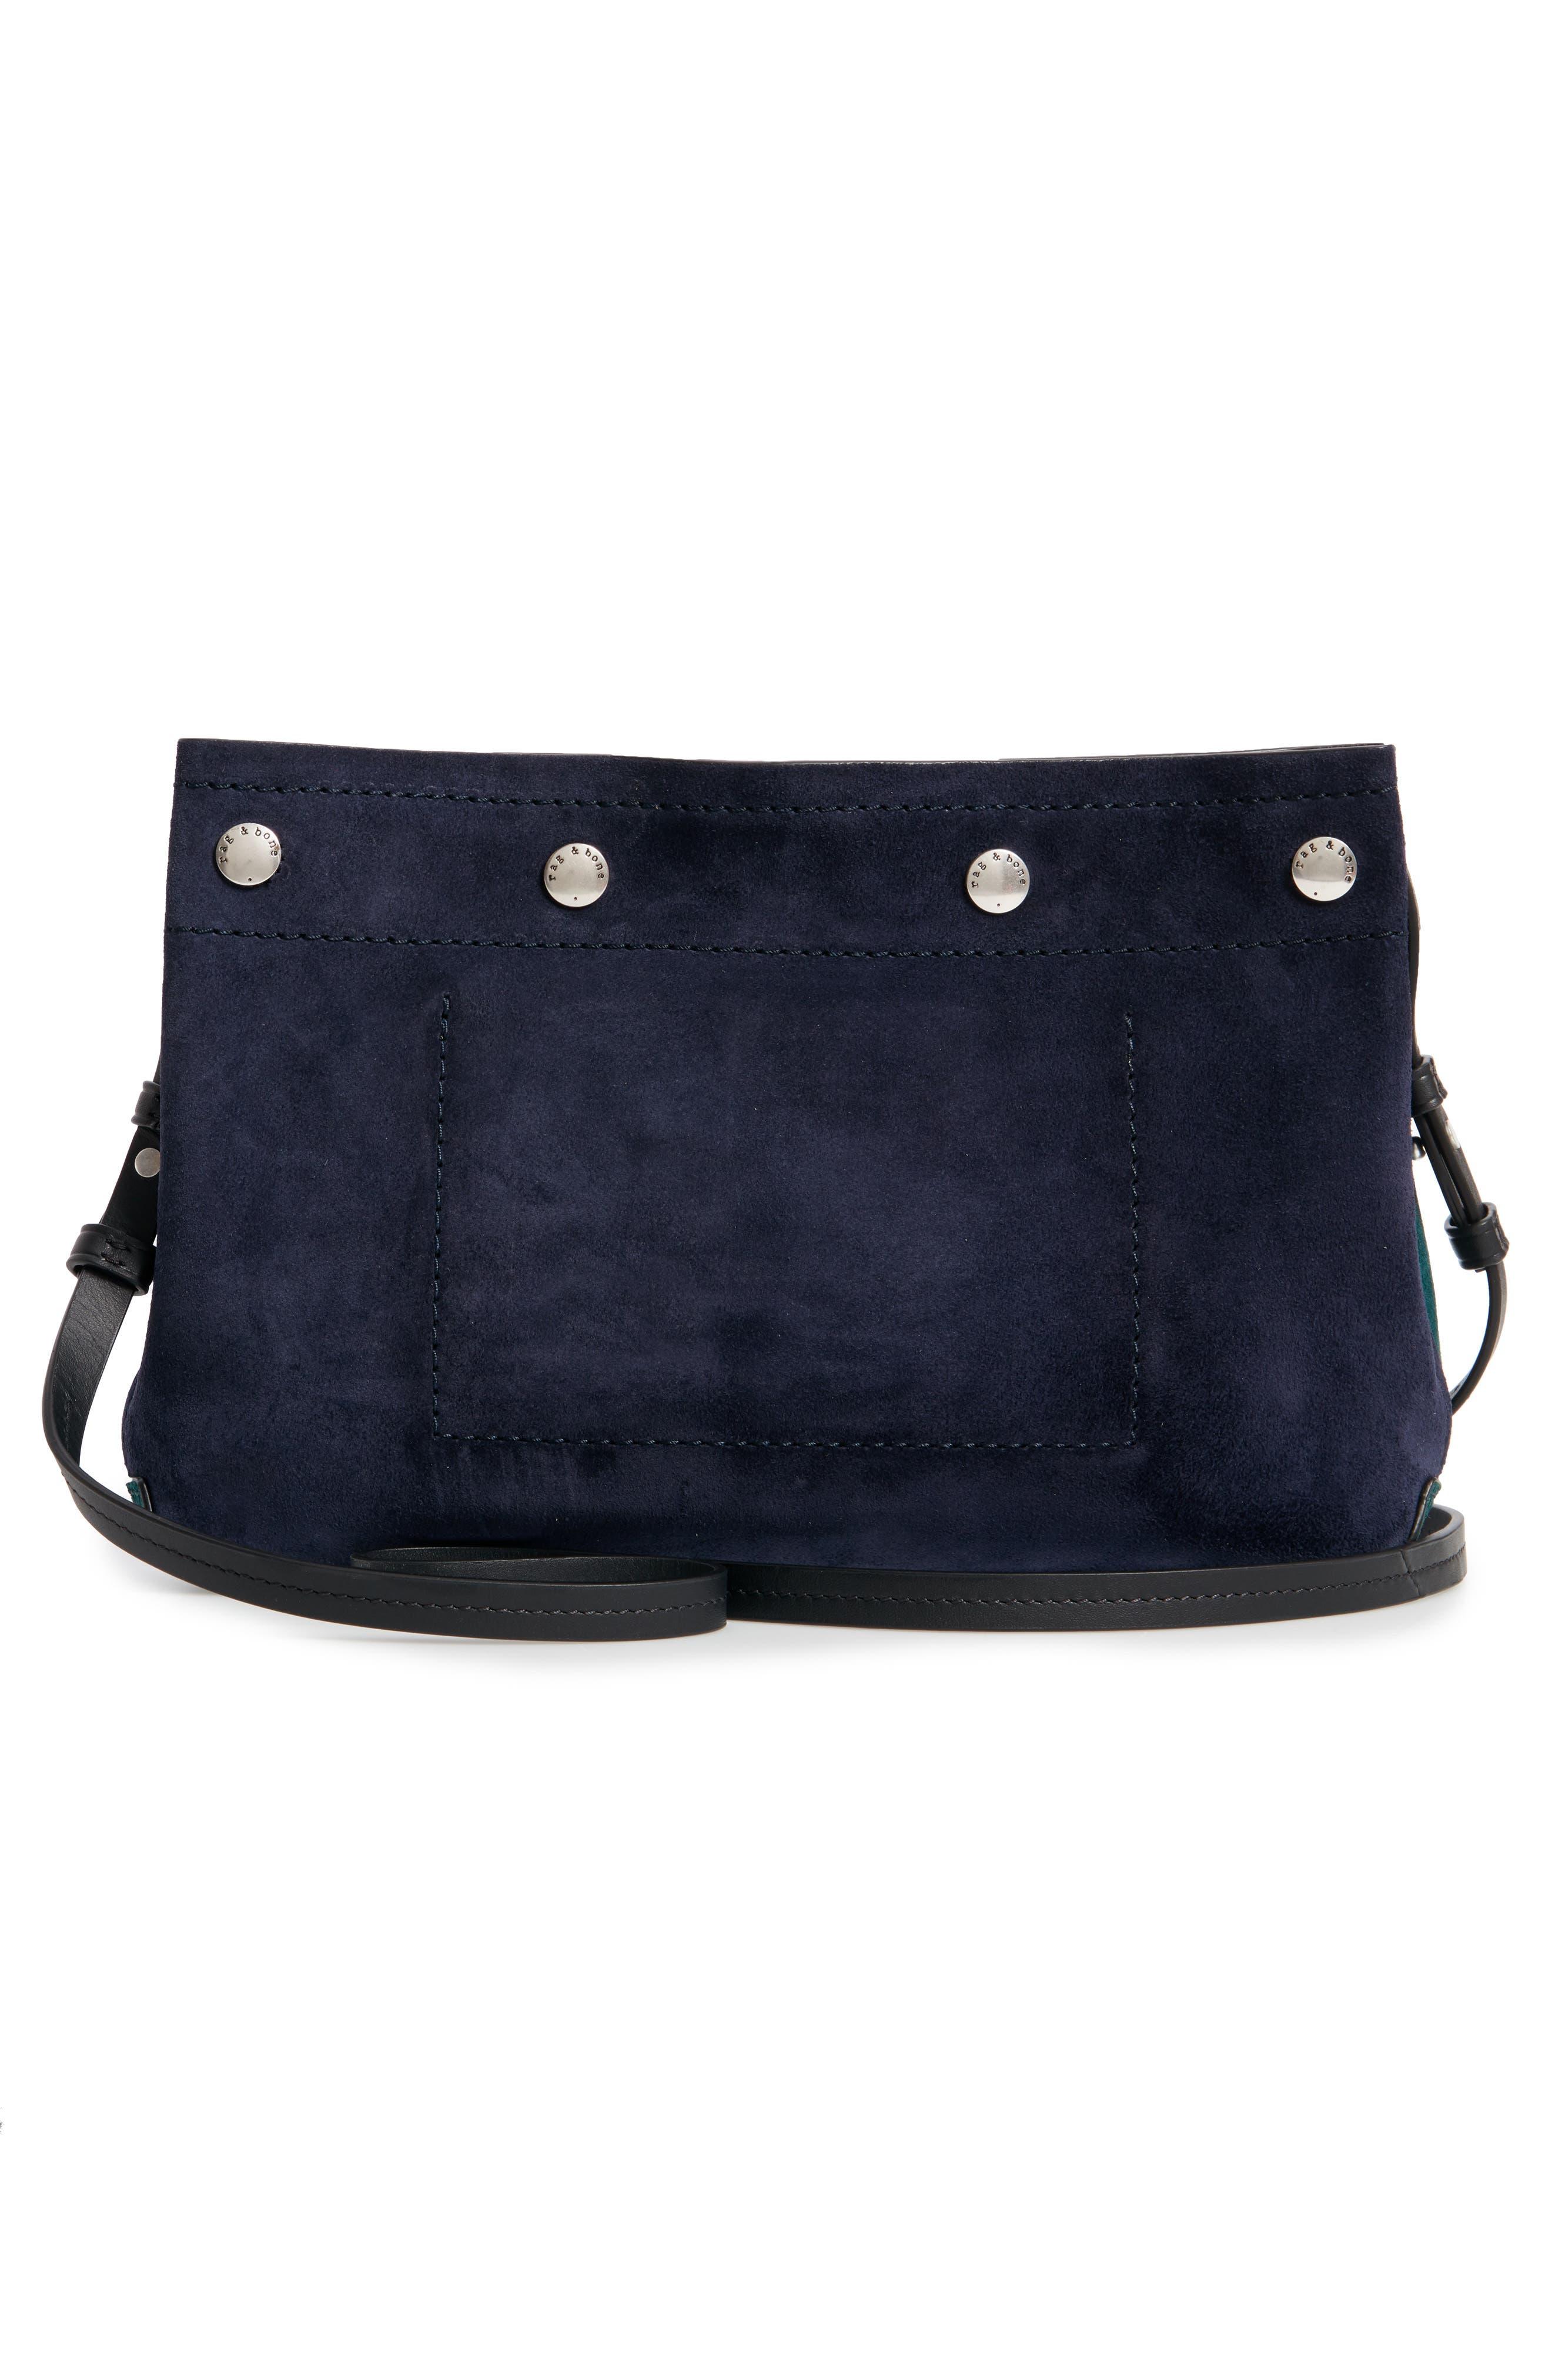 RAG & BONE,                             Compass Colorblock Leather Crossbody Bag,                             Alternate thumbnail 3, color,                             FOREST MULTI